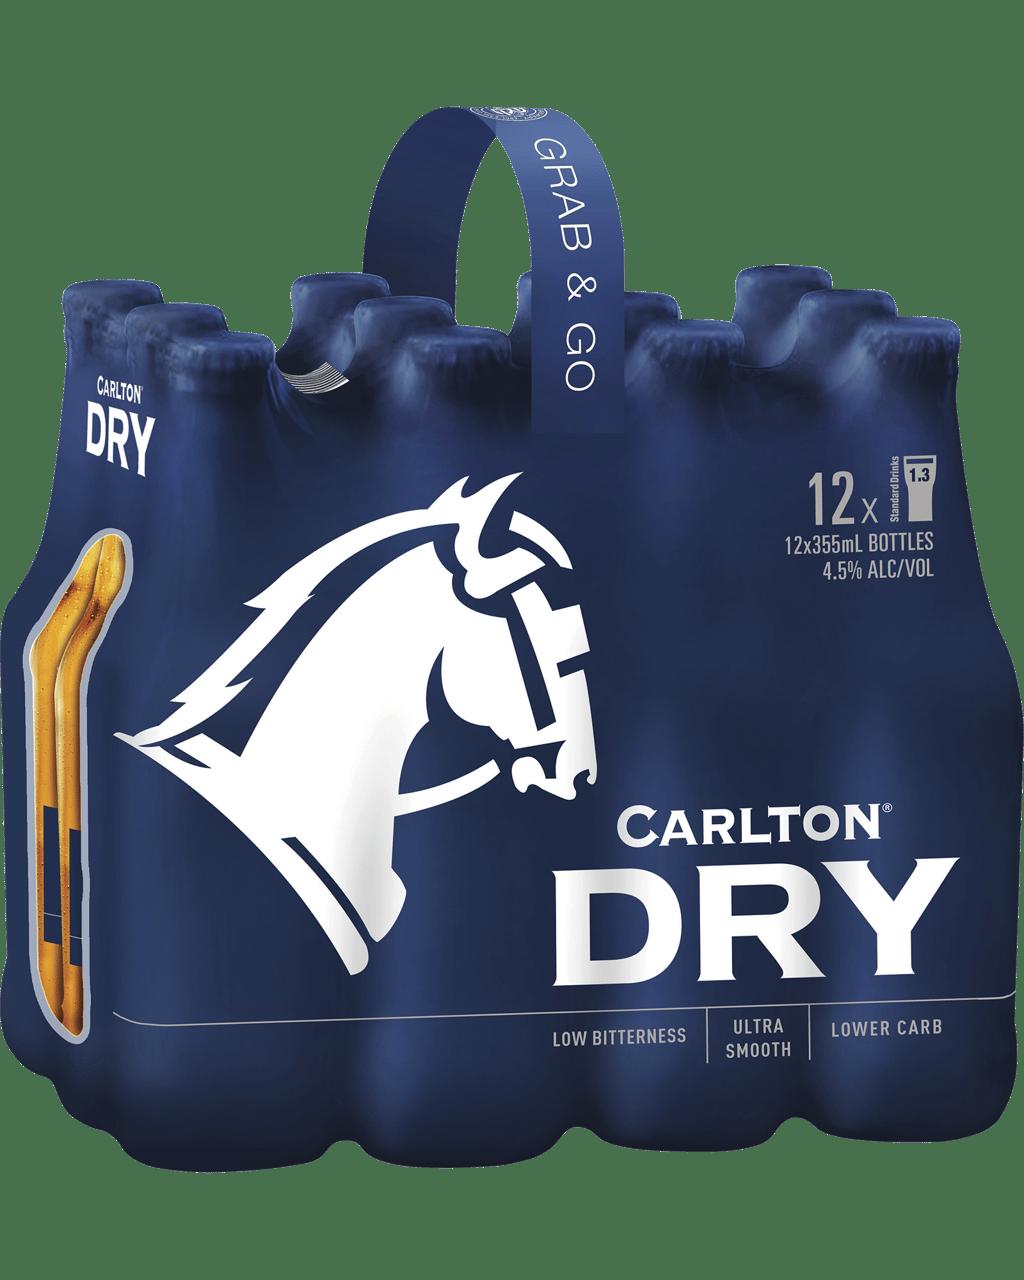 2cdc7157ca0 Carlton Dry Grab   Go 12 Pack 355mL